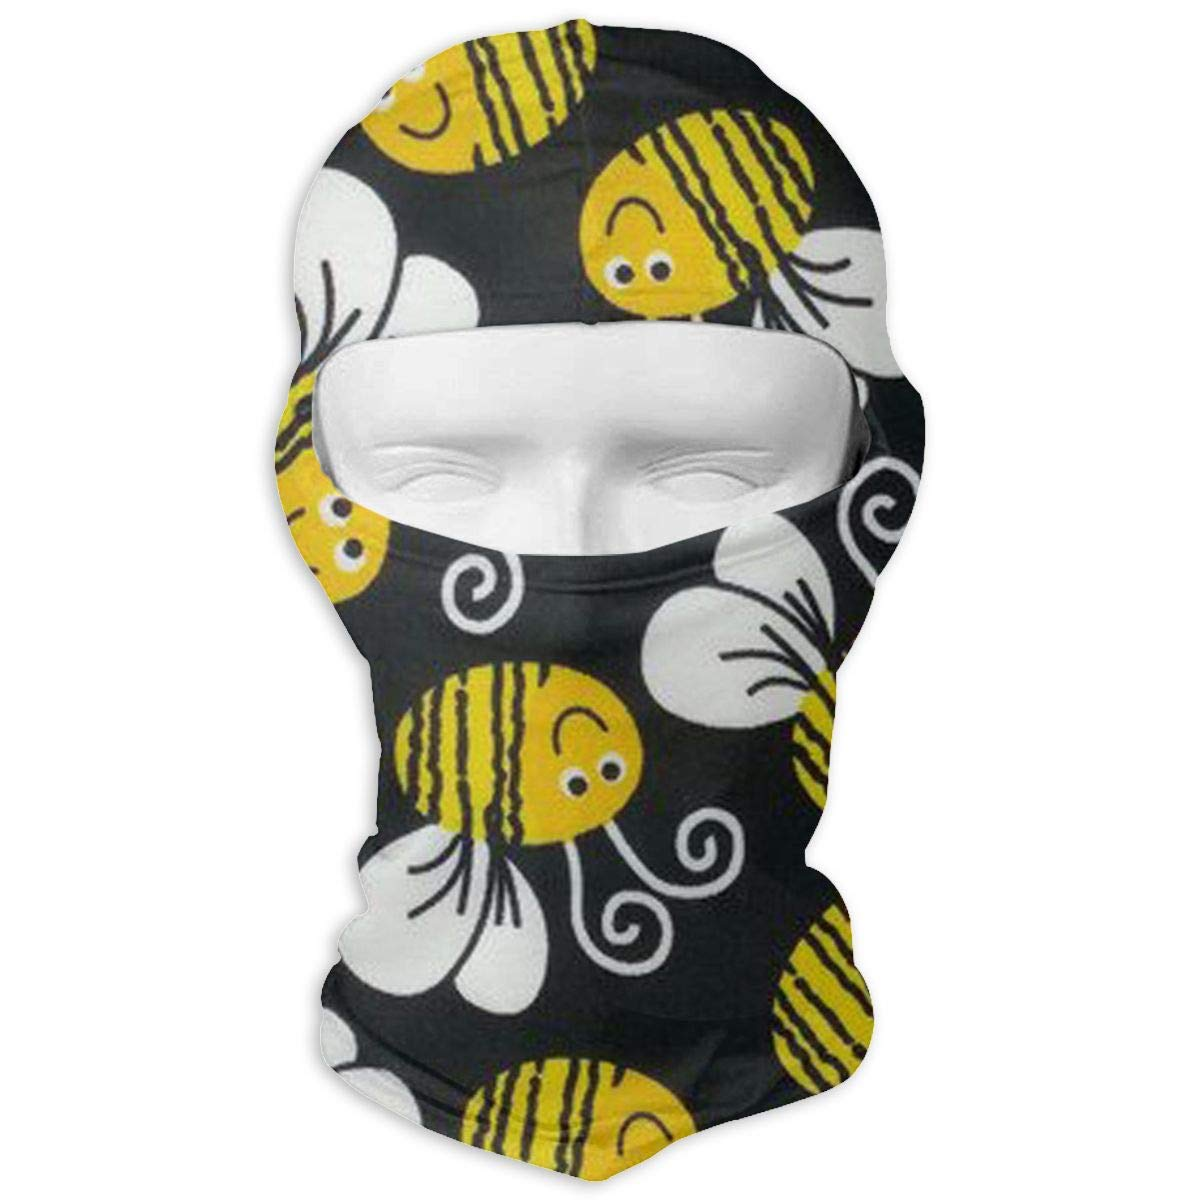 LaoJi Cute Bumblebee Winter Ski Mask Balaclava Hood Wind-Resistant Face Mask